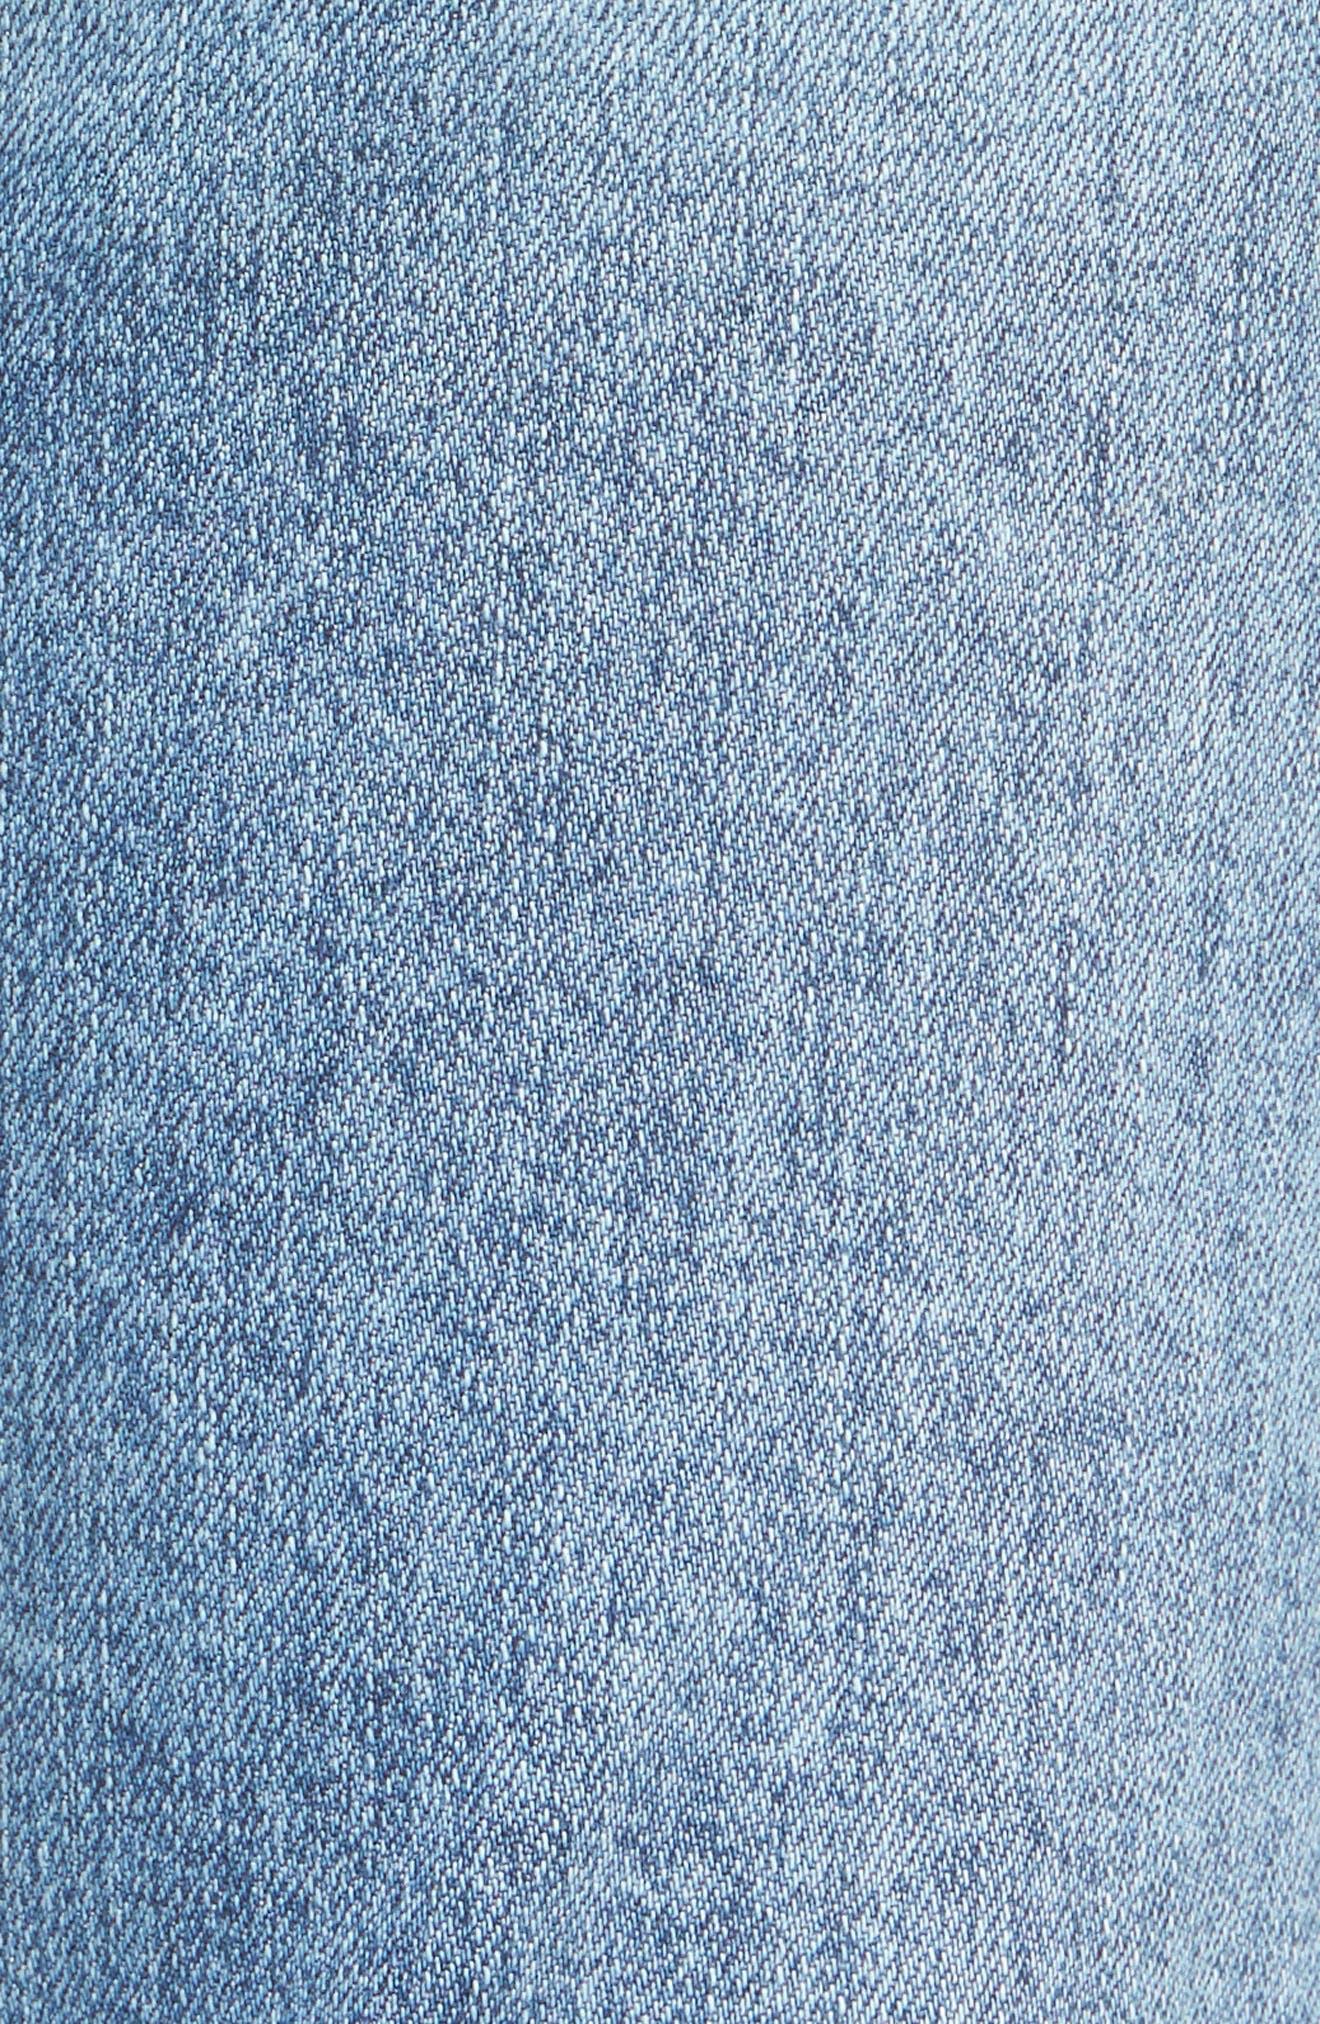 Release Hem Ankle Skinny Jeans,                             Alternate thumbnail 5, color,                             Rockaway Beach- Rckb